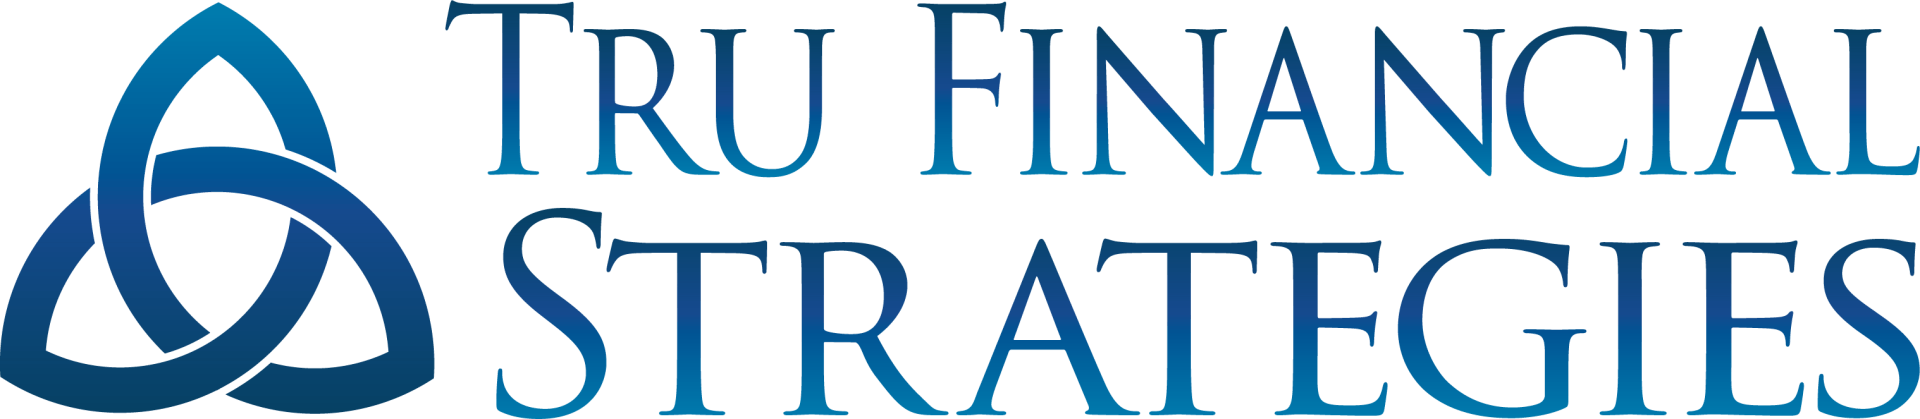 hoffman investment services llc